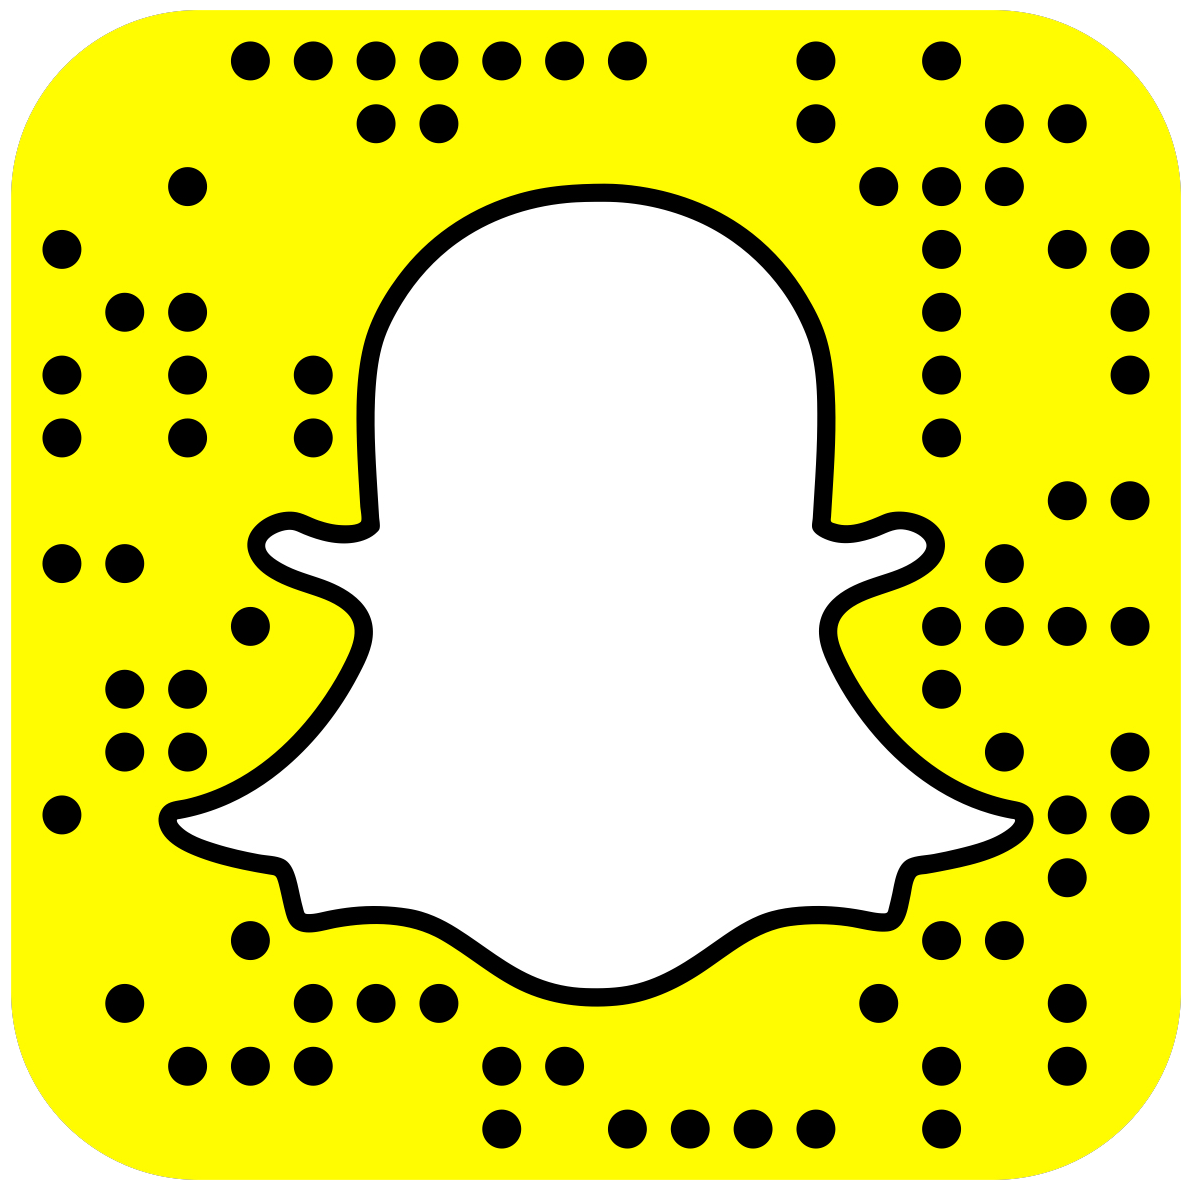 Jacqueline Jossa Snapchat username